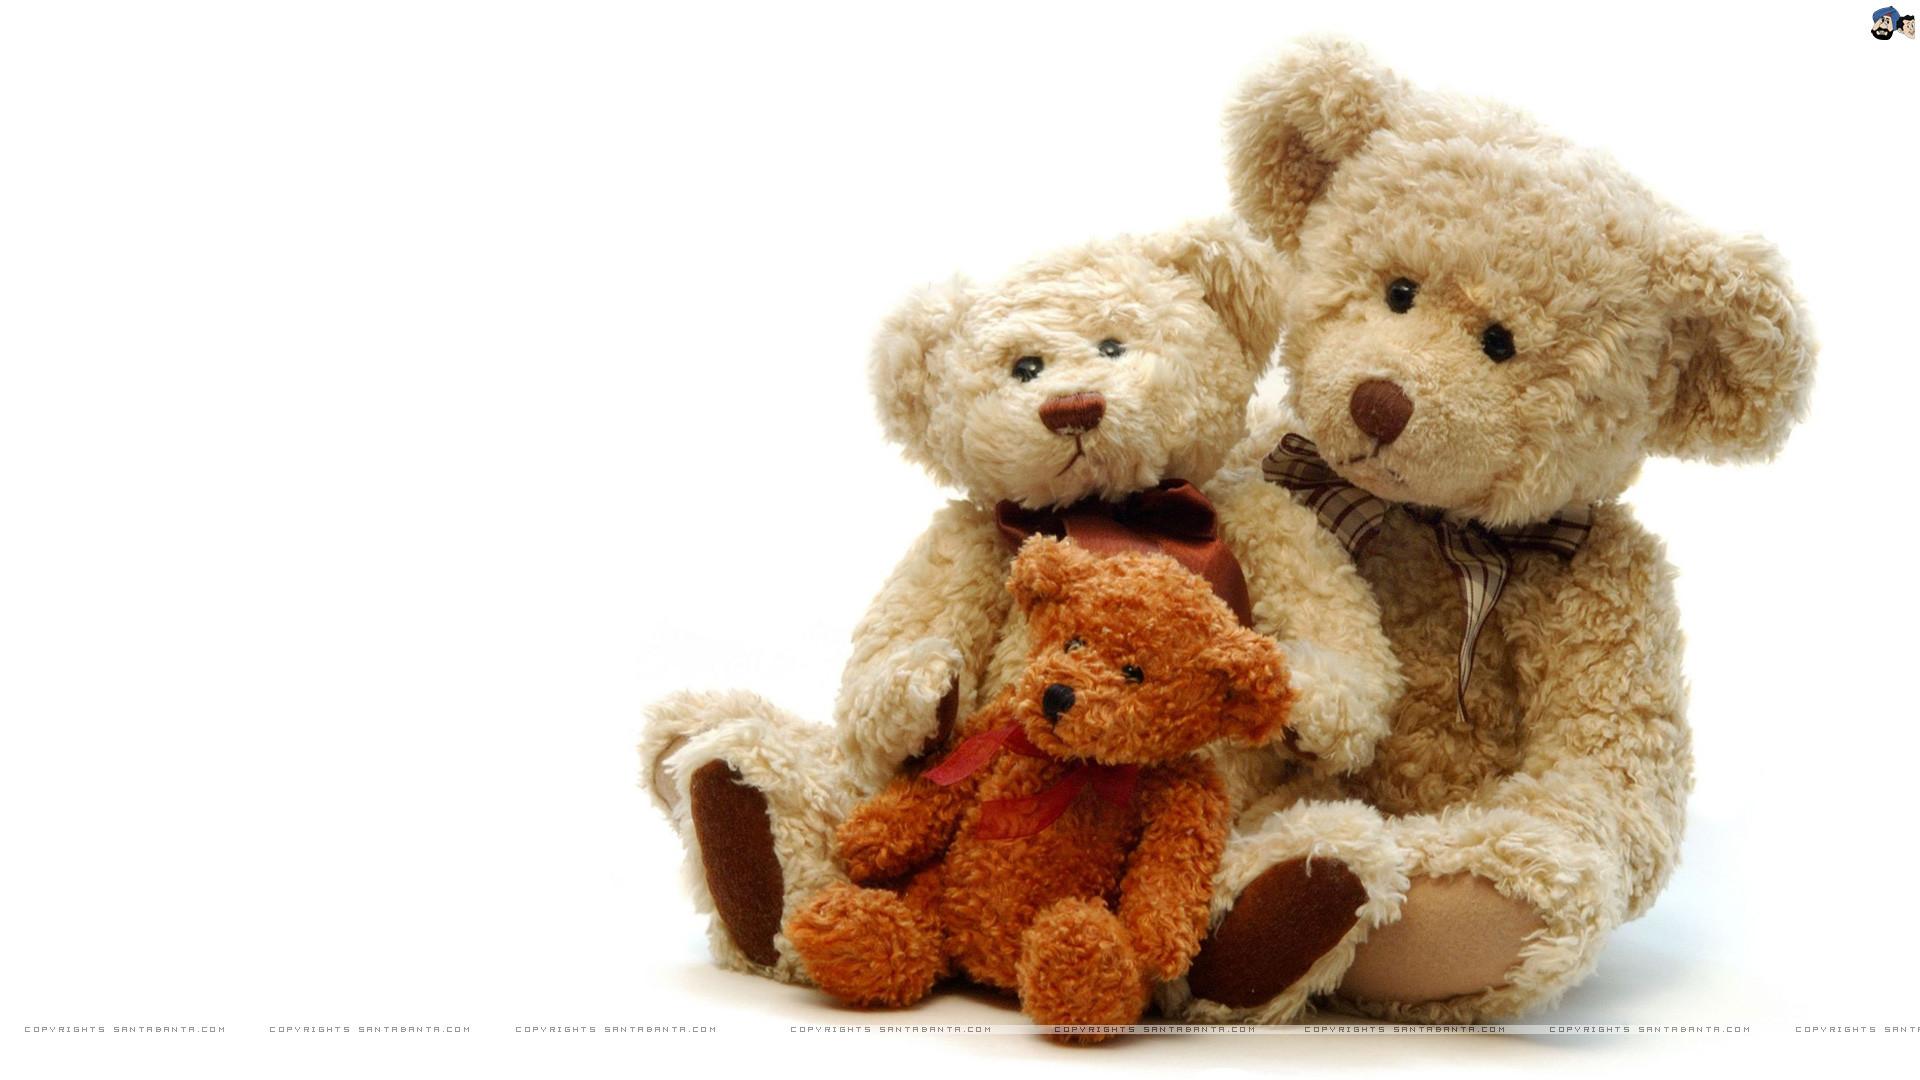 Cute teddy bear wallpapers 1920x1080 cute teddy bear love wallpaper wallpaper download voltagebd Images